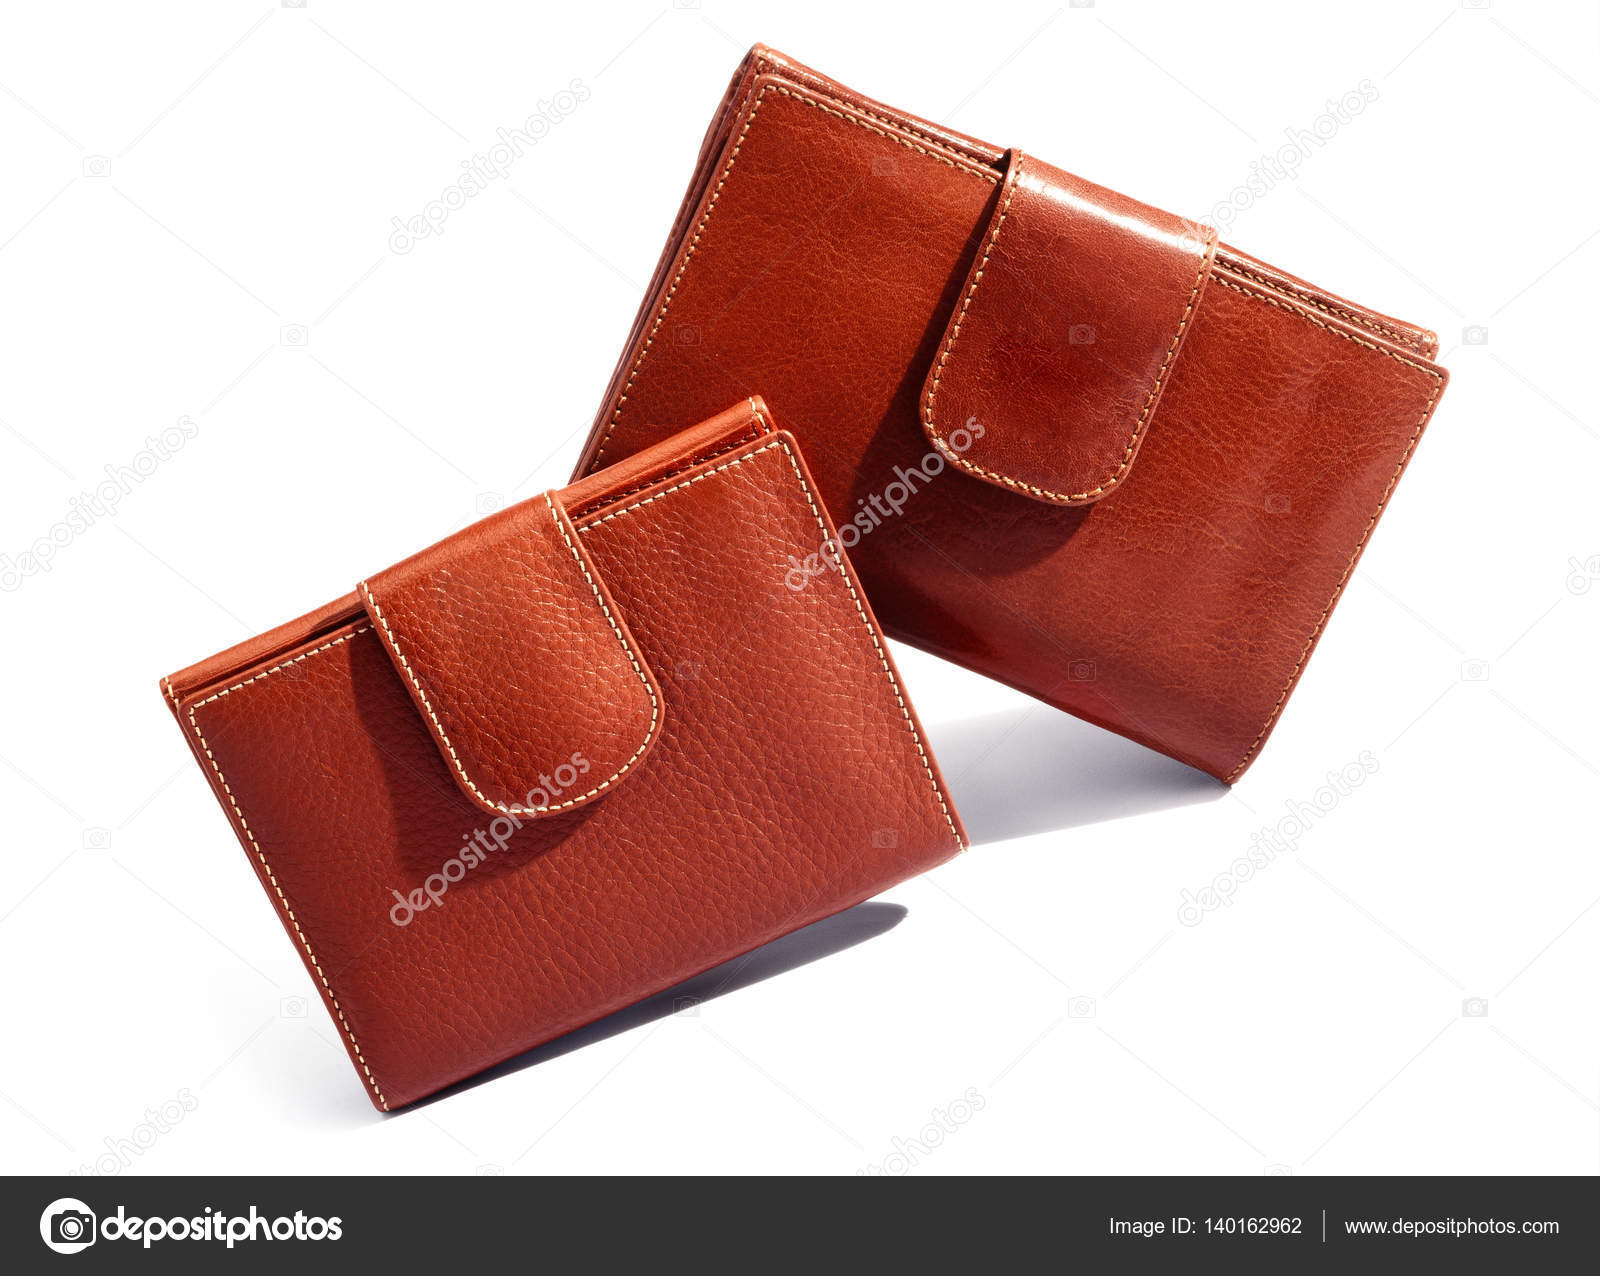 093b4a9b30 γνήσια δερμάτινα πορτοφόλια — Φωτογραφία Αρχείου © estudiosaavedra ...